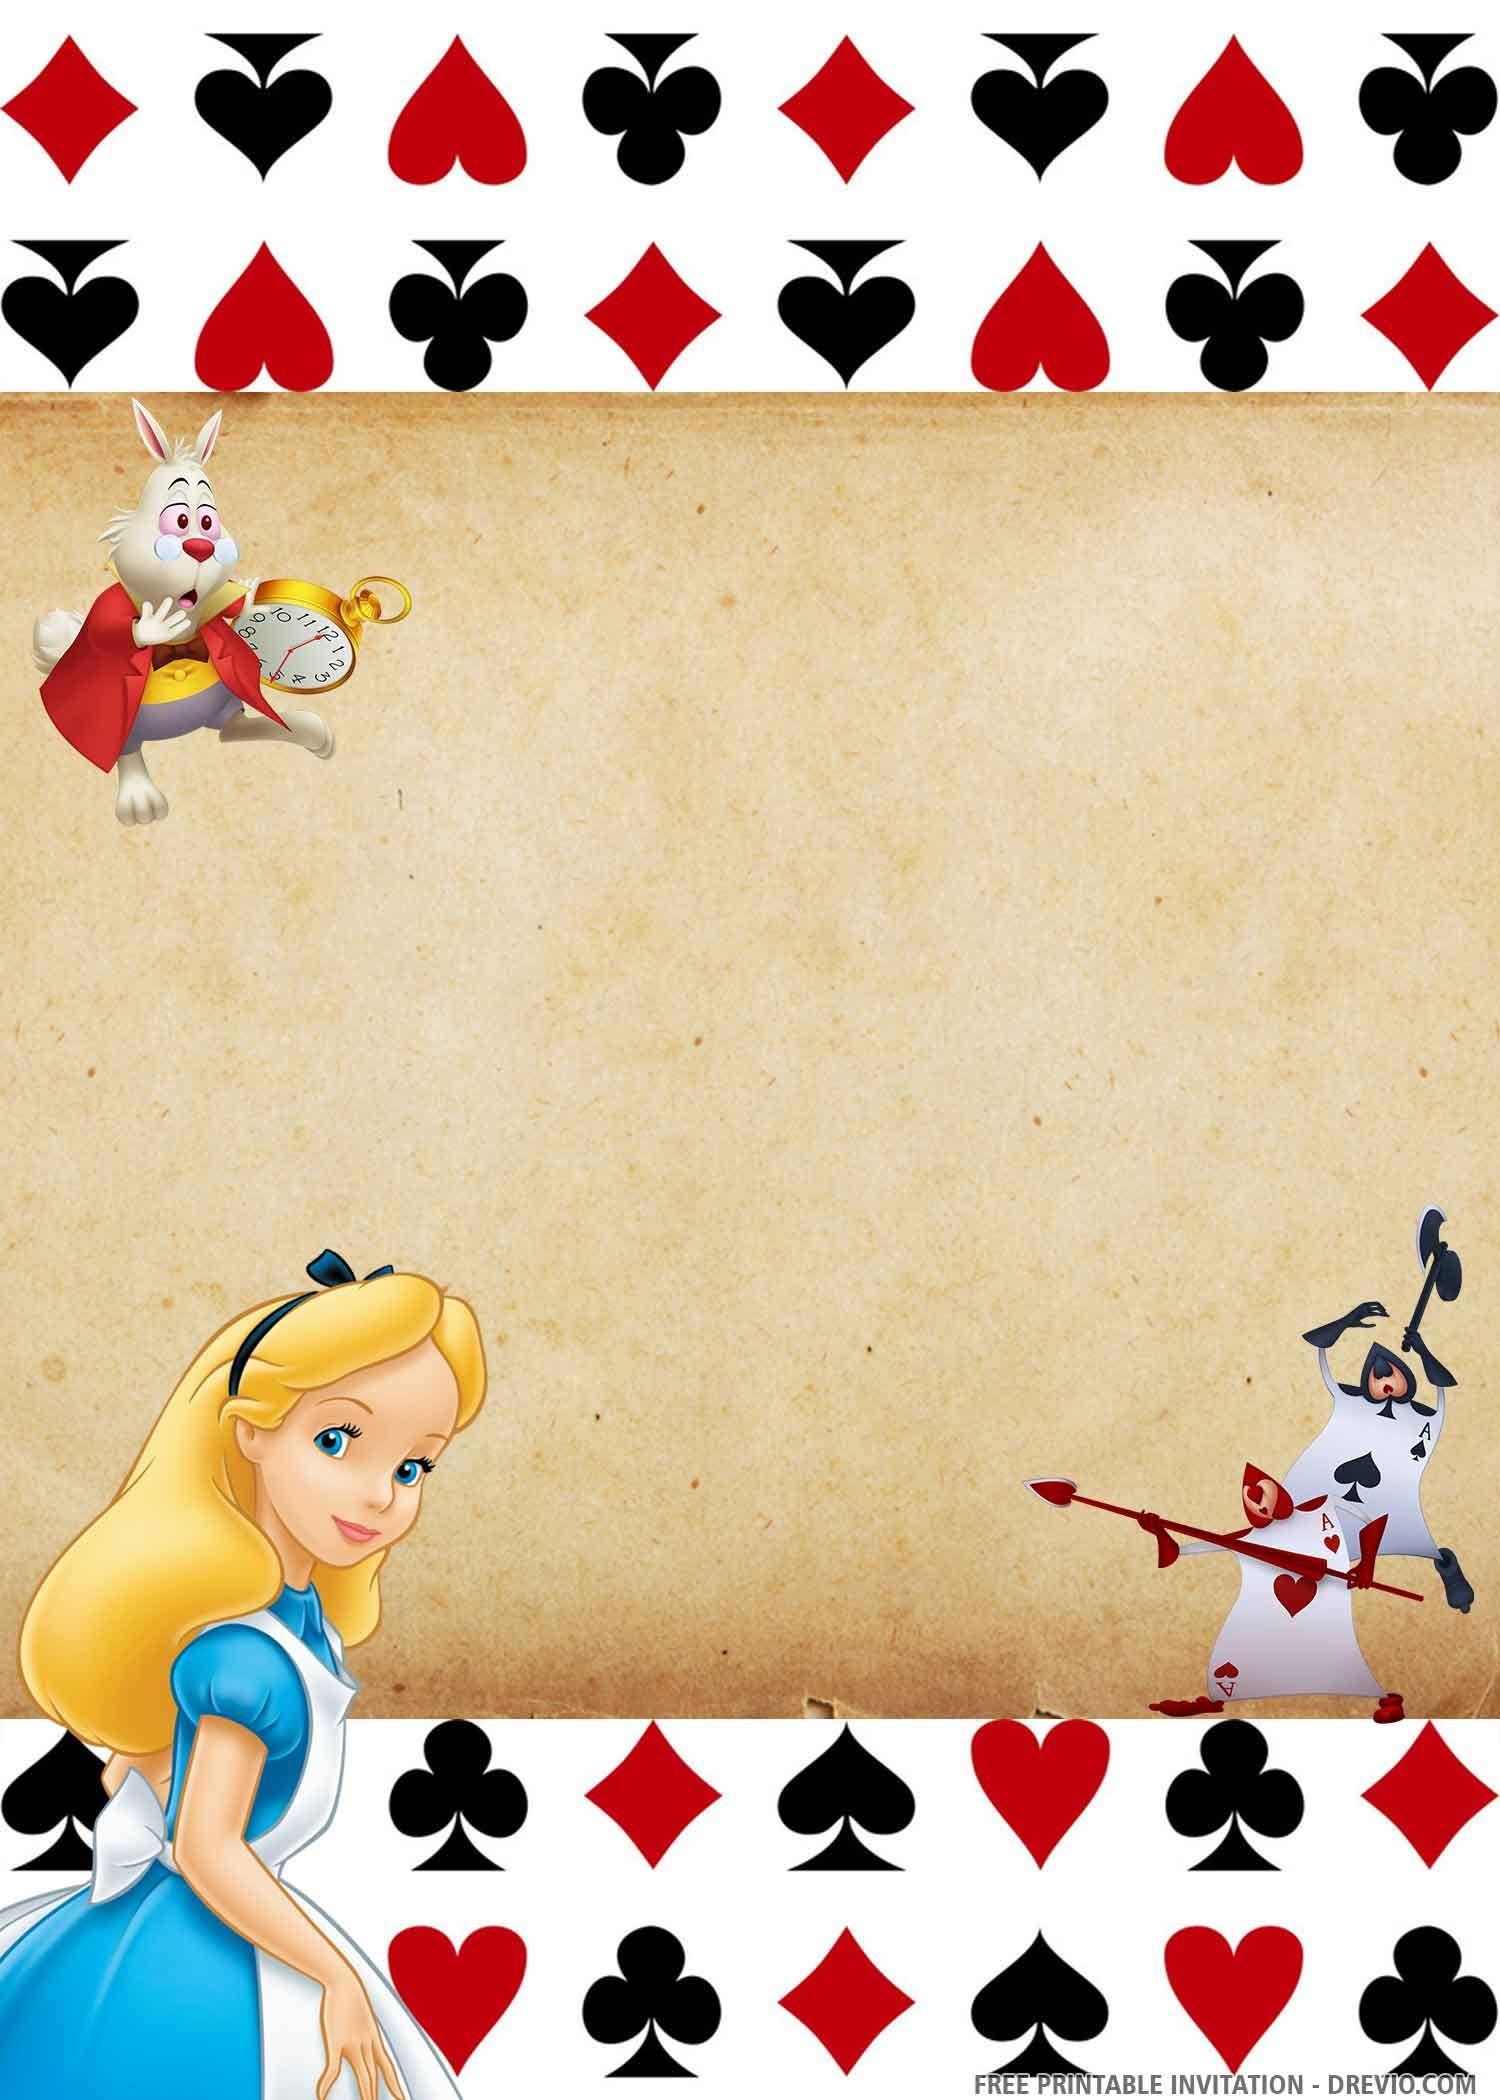 007 Wonderful Alice In Wonderland Birthday Party Invitation Printable Free Design Full